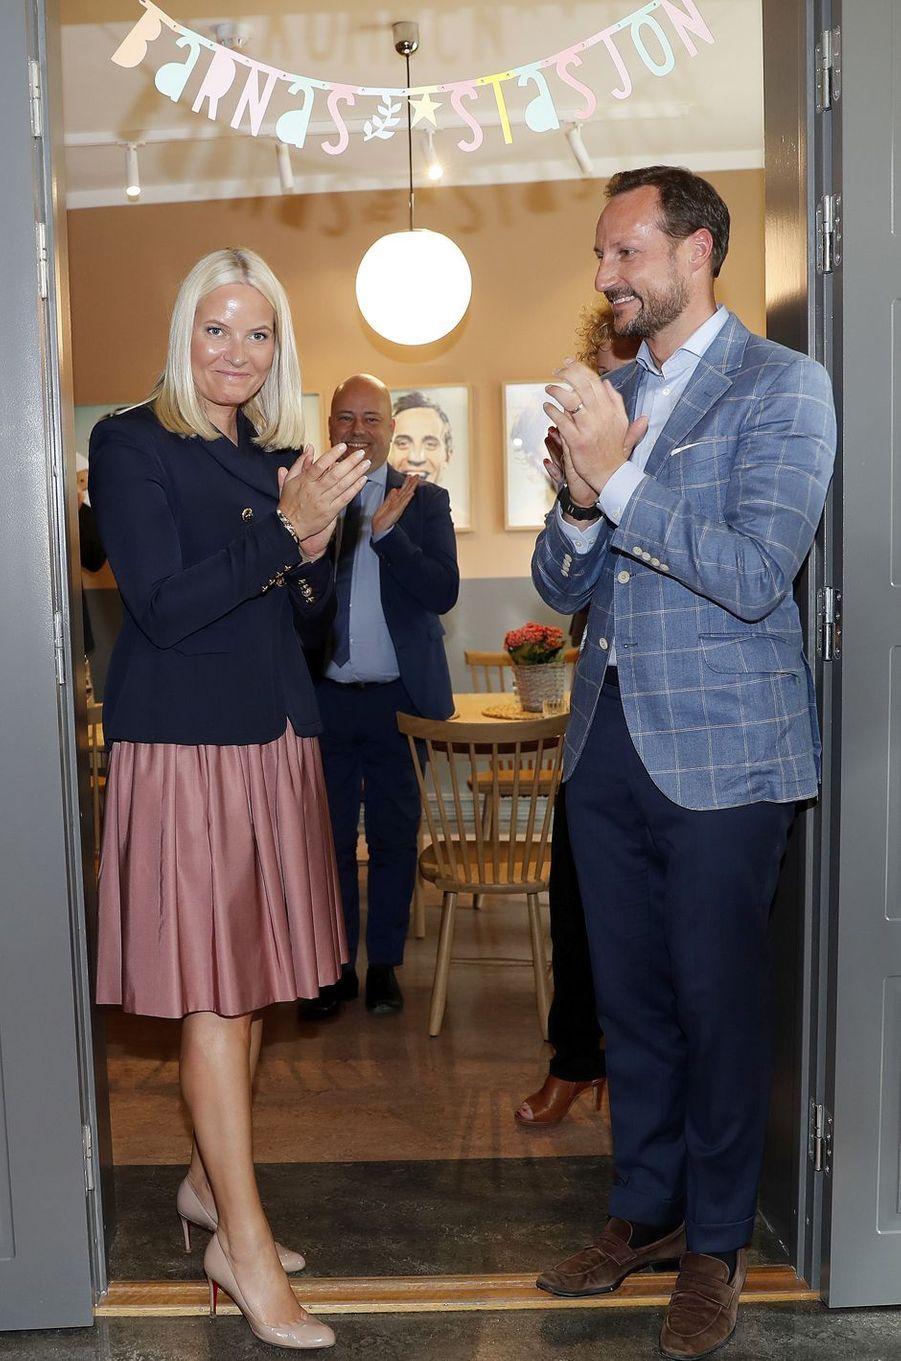 La princesse Mette-Marit et le prince Haakon de Norvège à Oslo, le 29 mai 2017